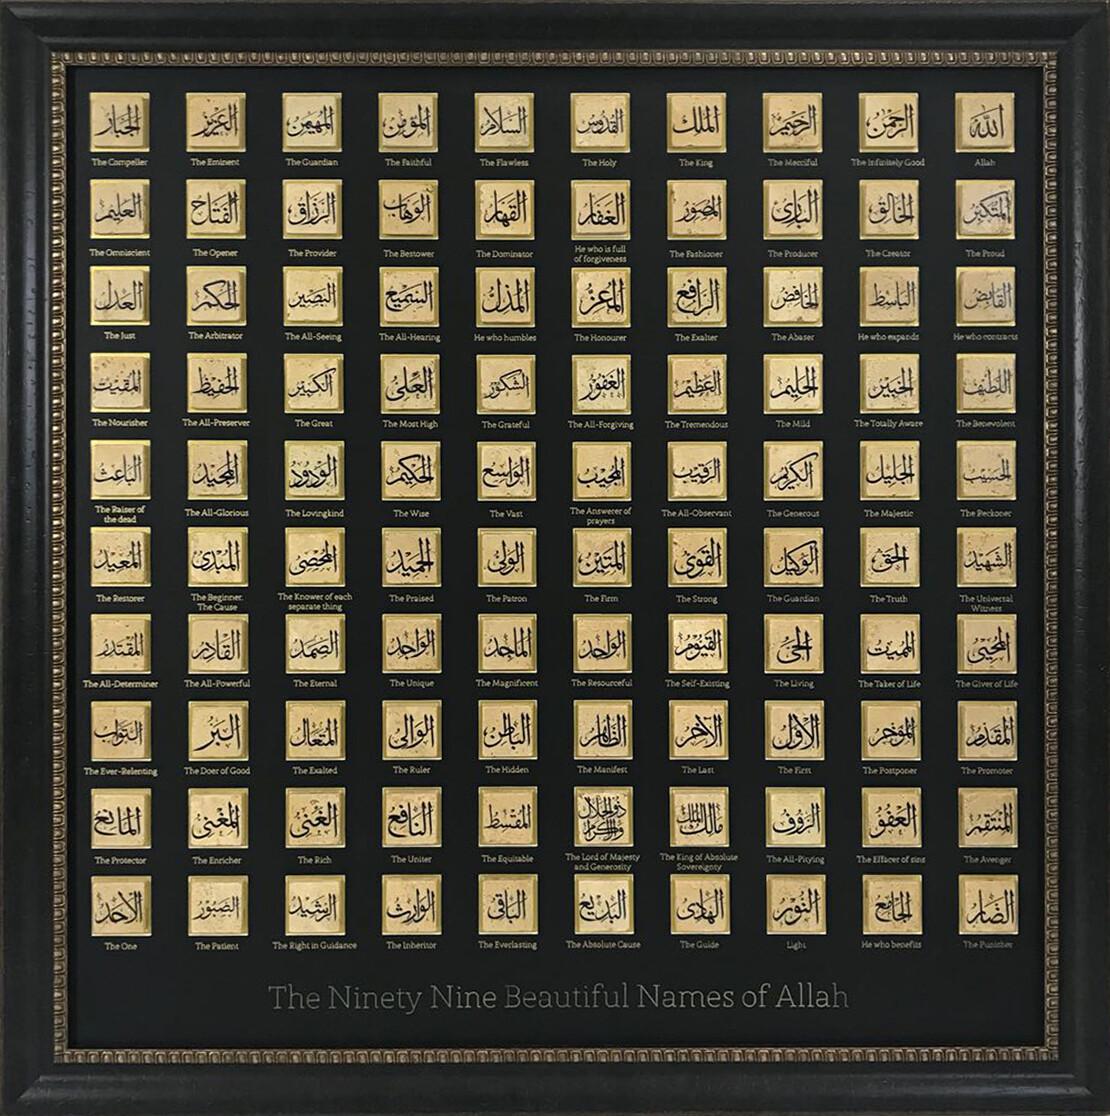 99 Names of Allah - Square Ex-Large Design in Black Leather Veneer Frame